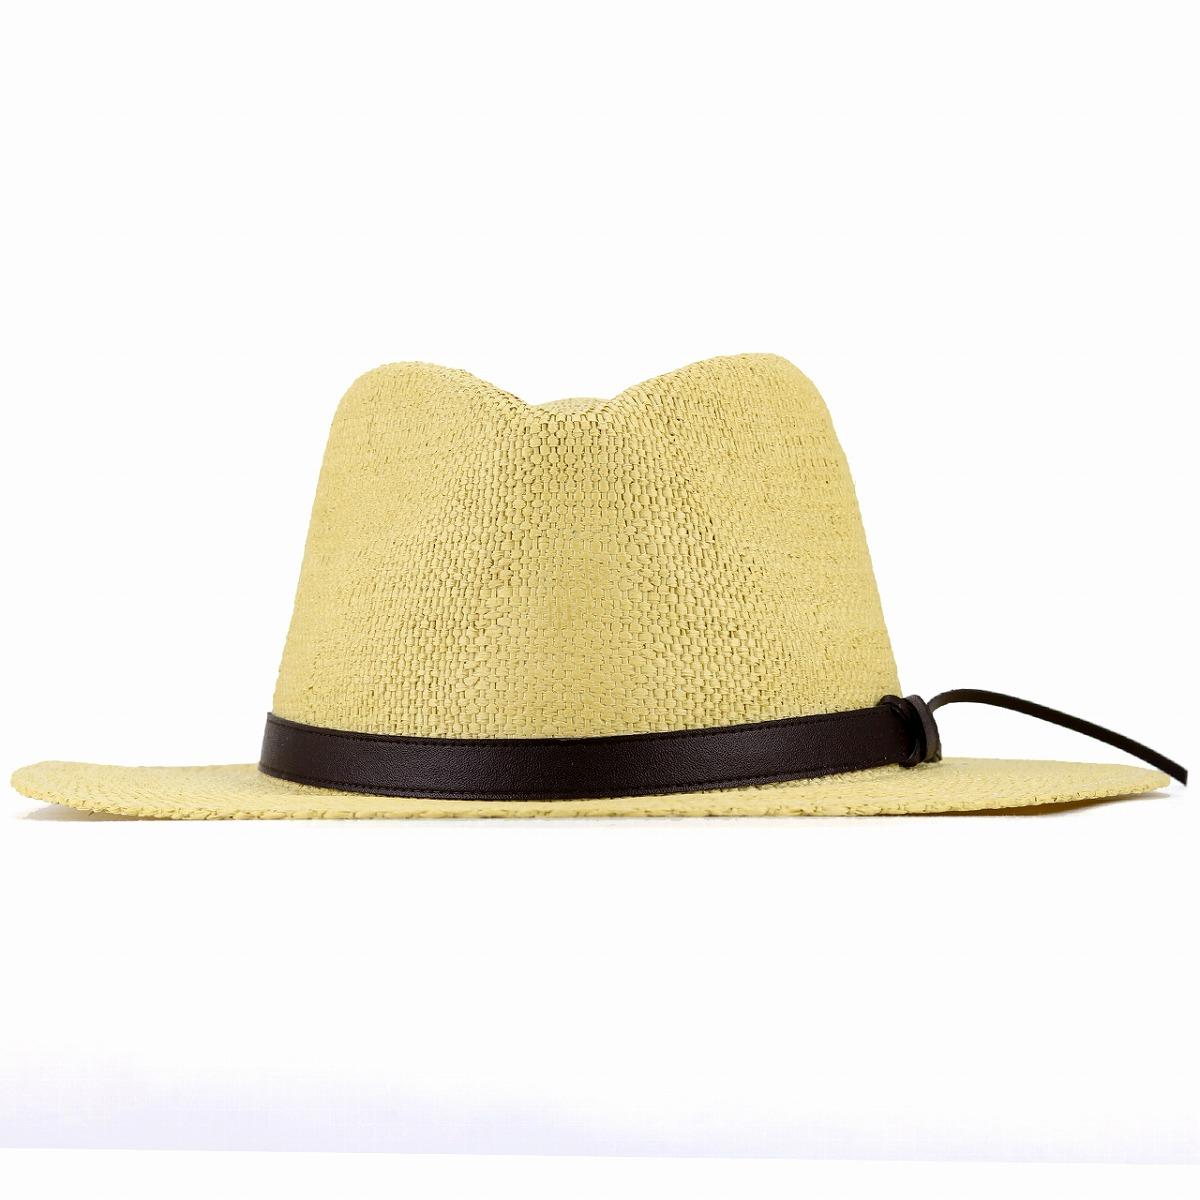 ... Straw hat SCALA CLASSIC Y ditch rim scalar cool classic paper straw hat  Toyo soft felt ... 4588a608153e